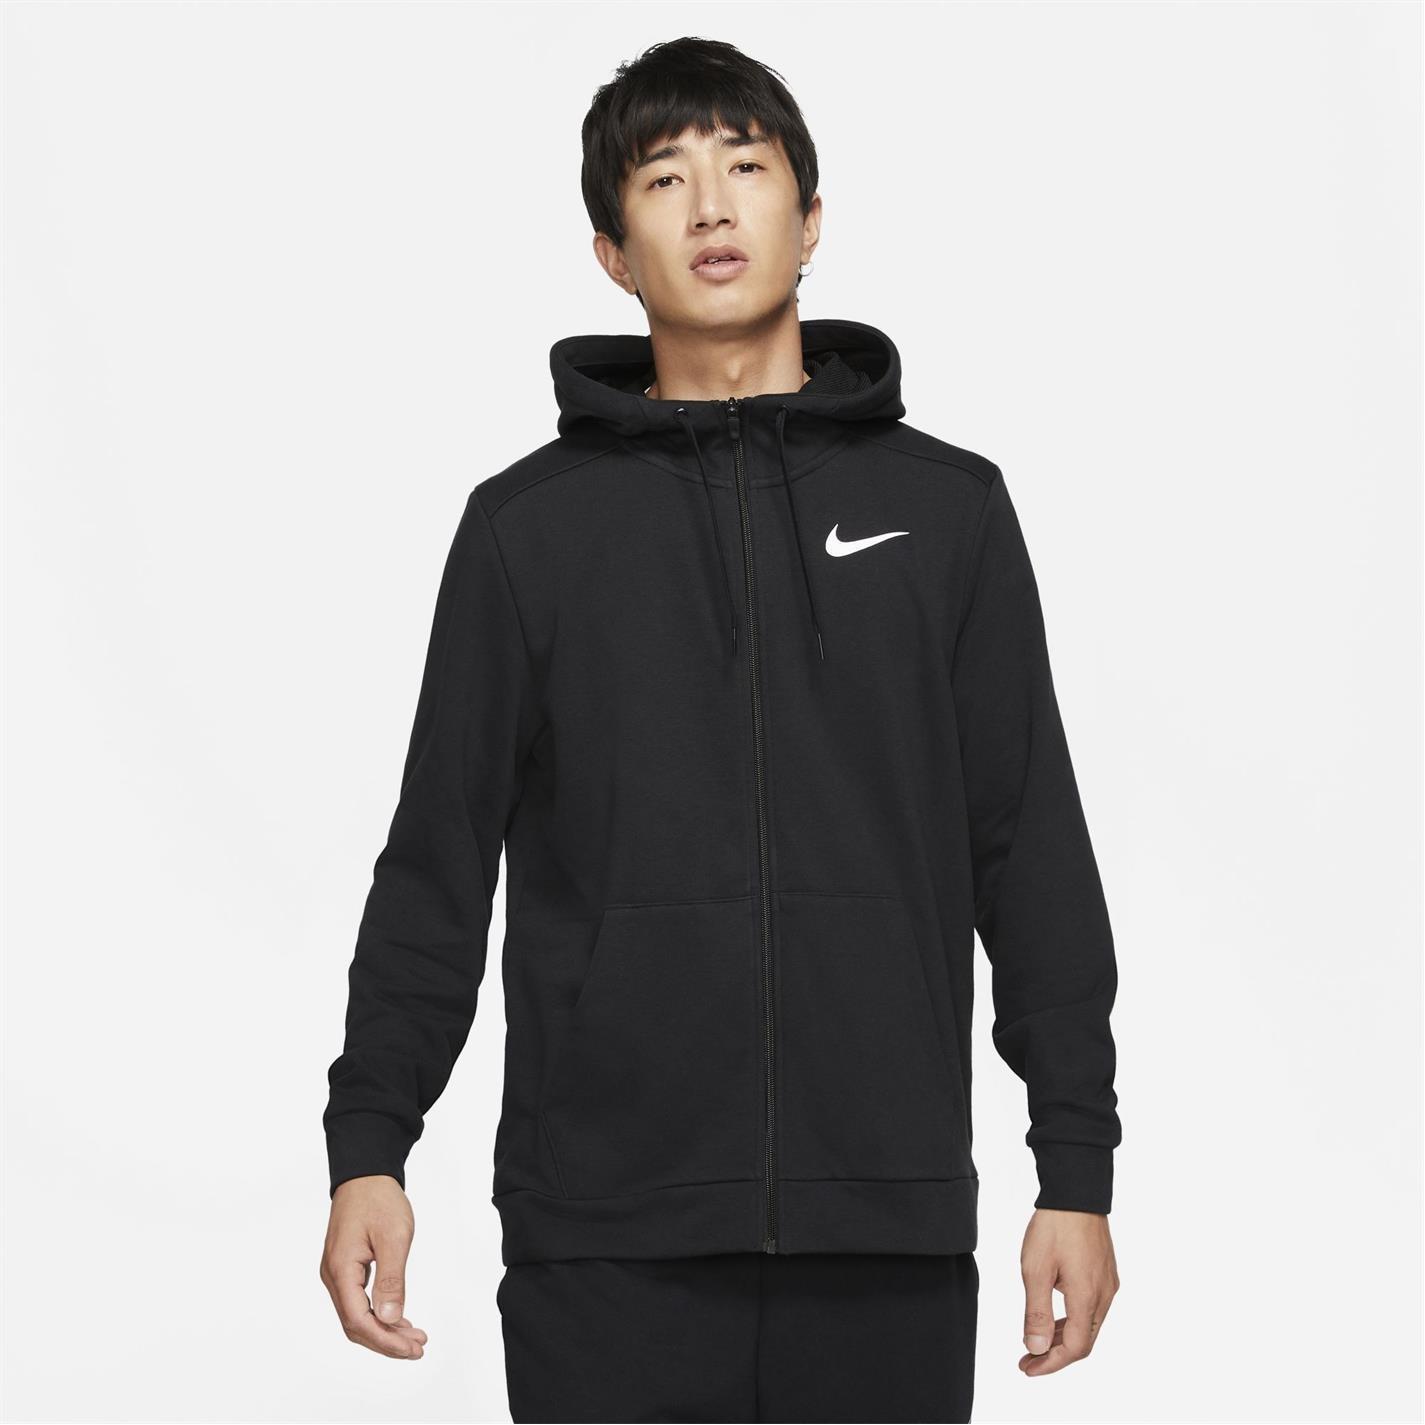 Nike Dry Zip pánská mikina Black 077c3da1f01